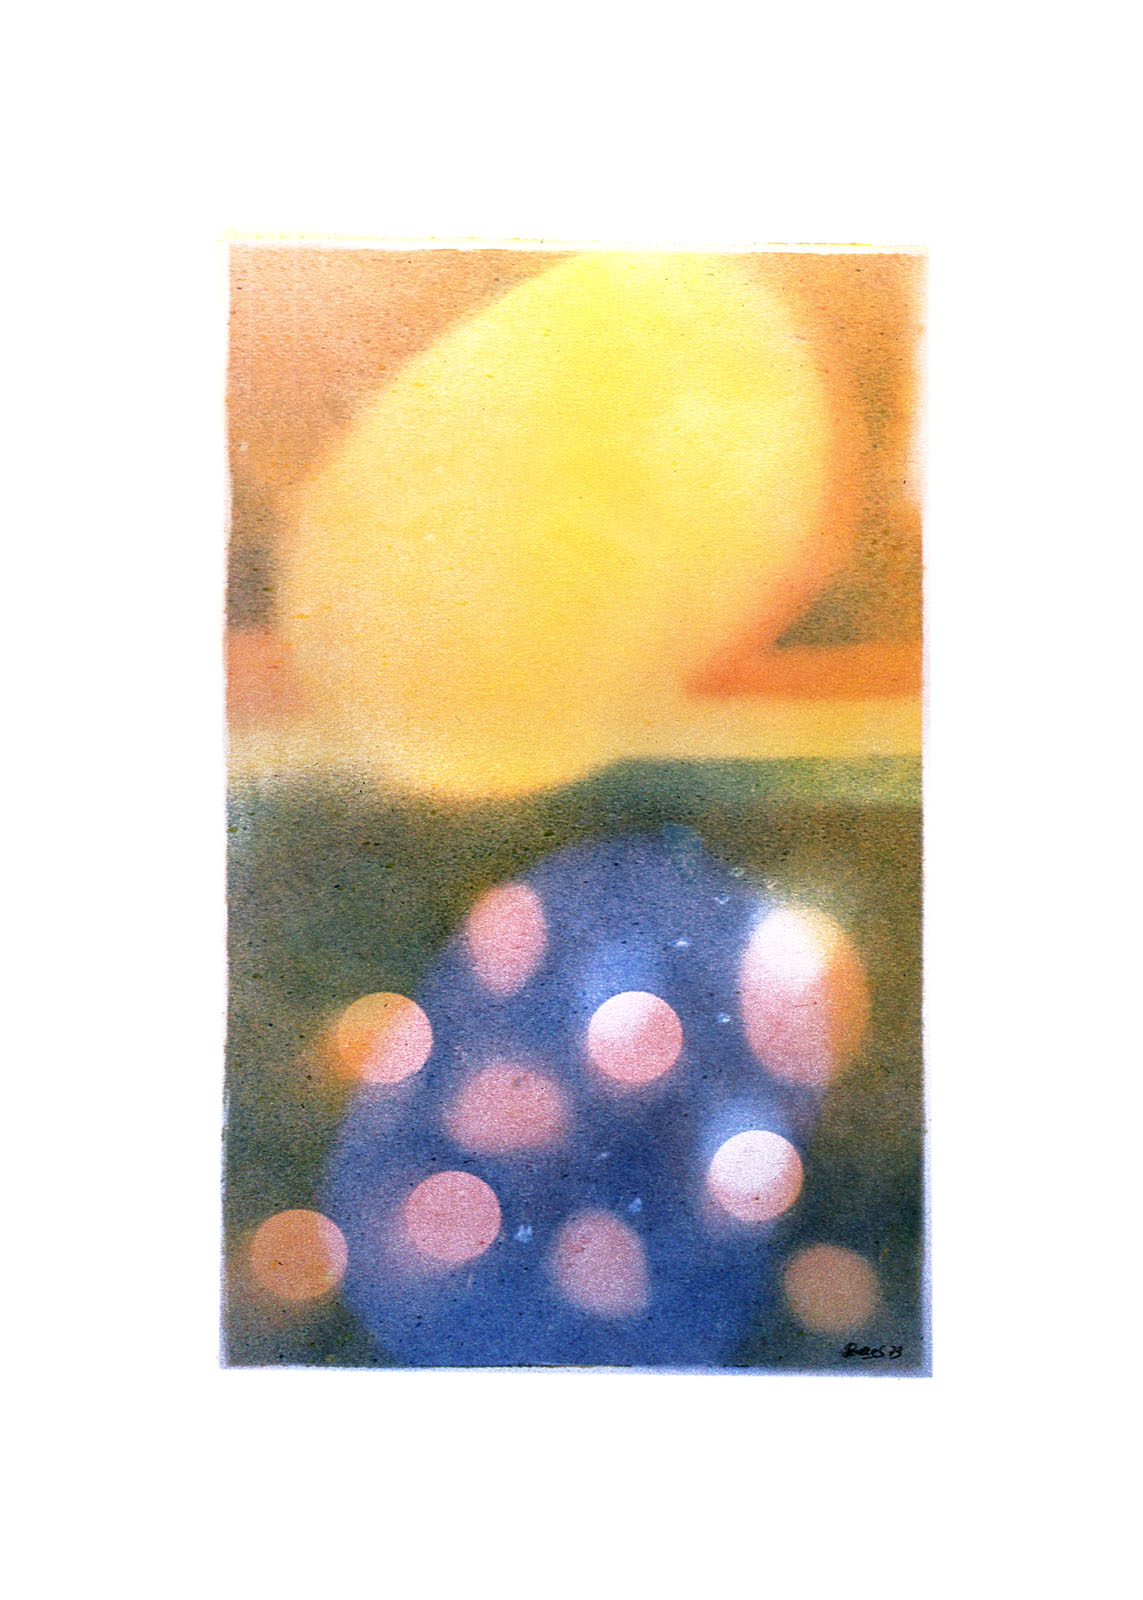 panies-danielvillalobos-spanish-painting-abstract-28